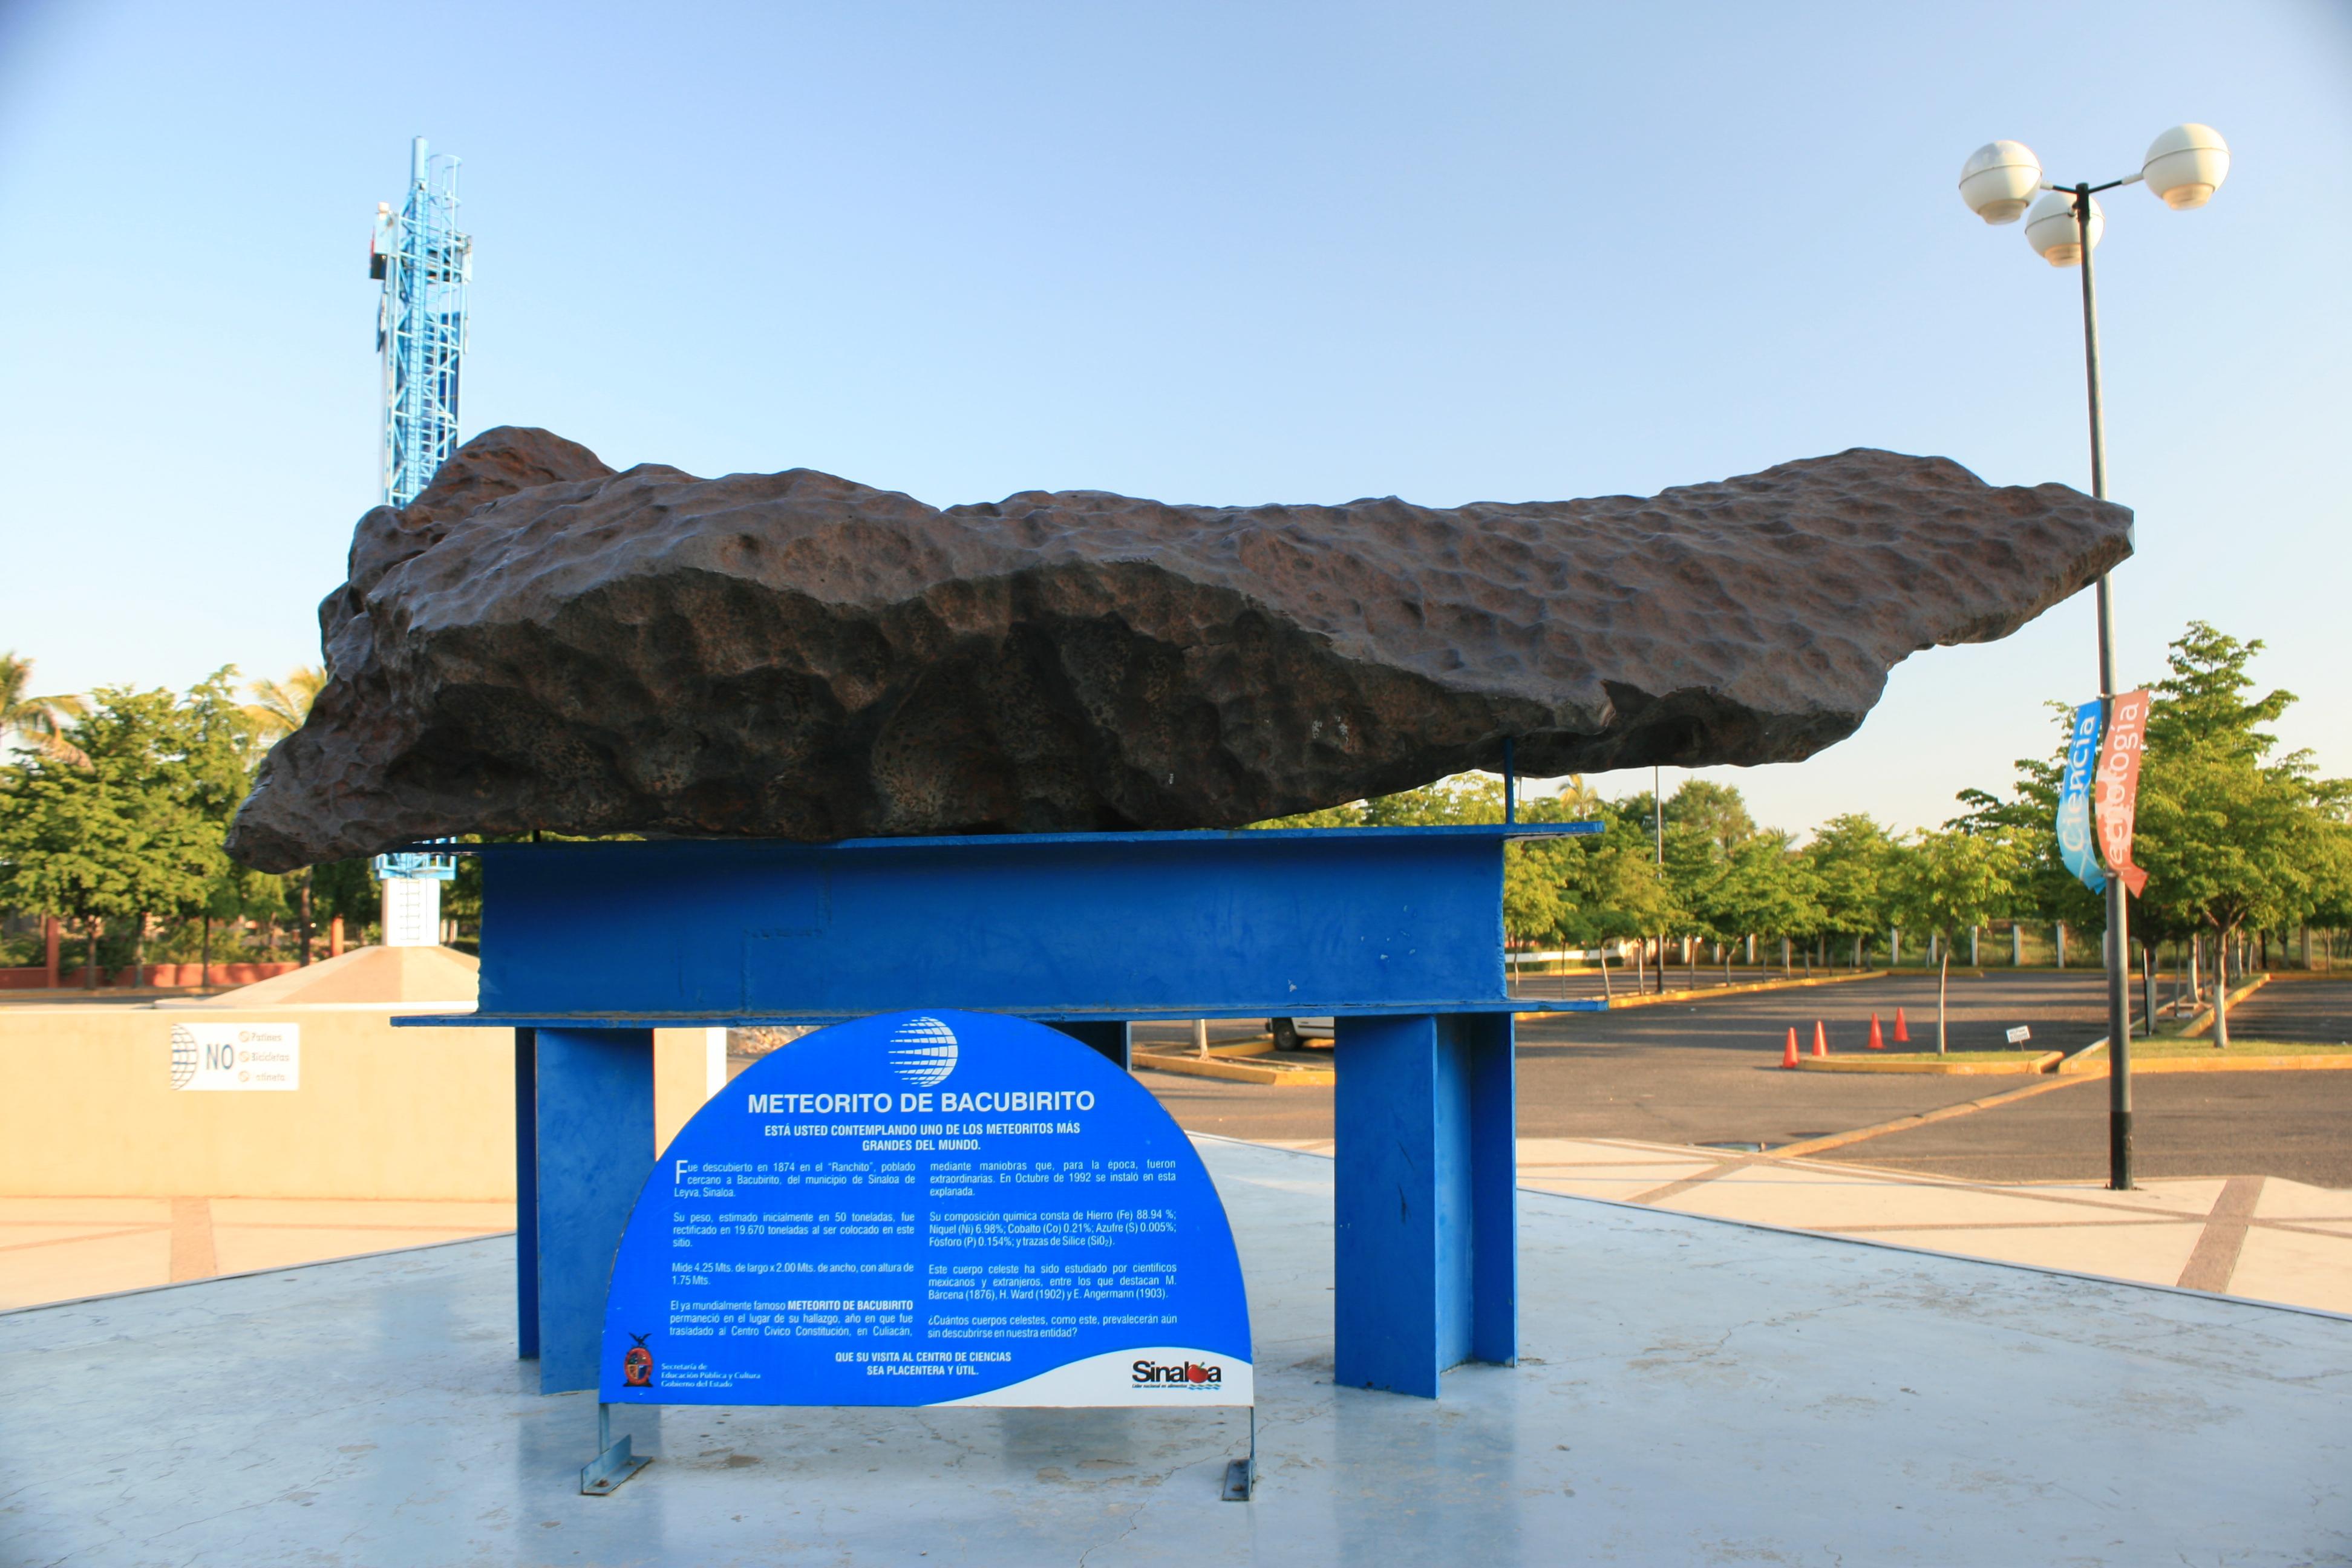 Bacubirito meteorite.jpg